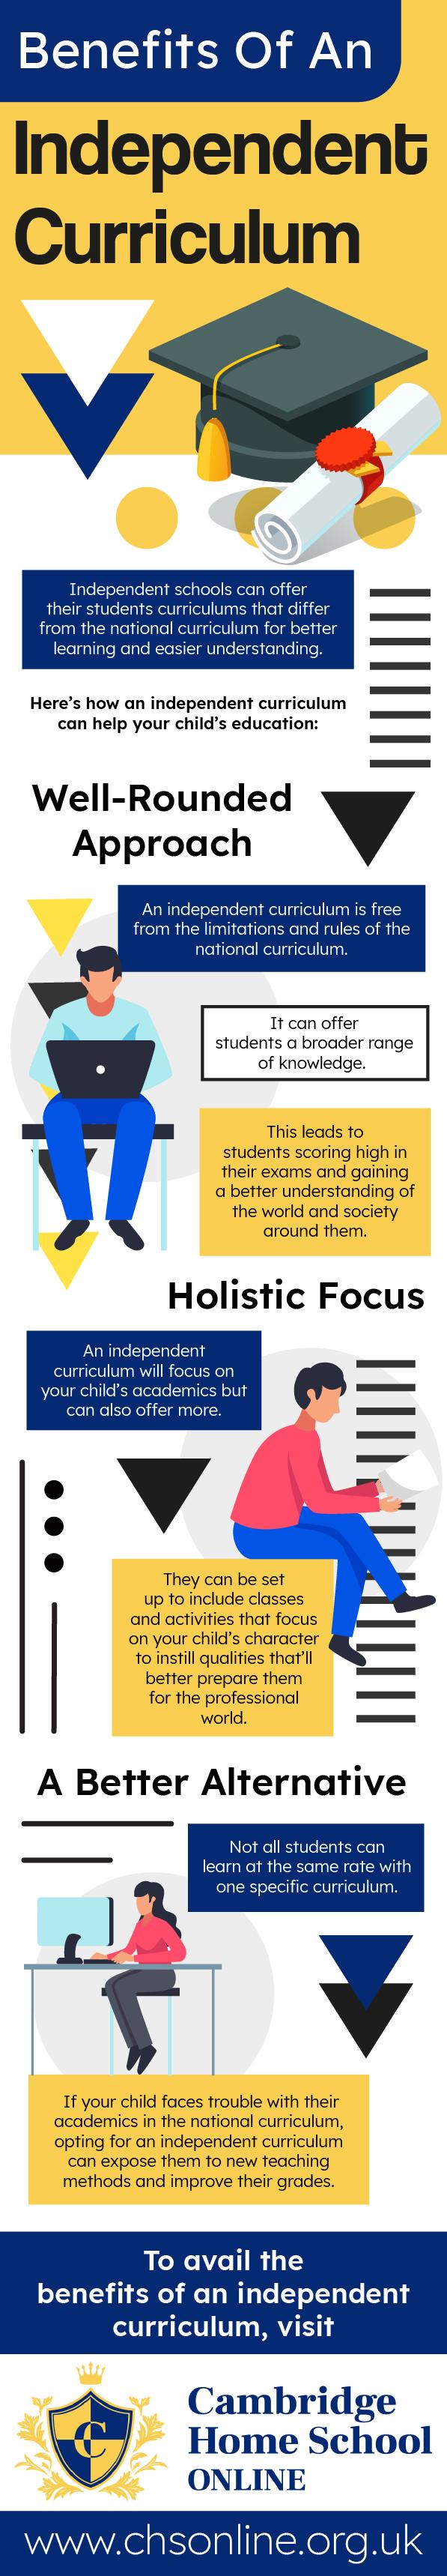 Benefits Of An Independent Curriculum